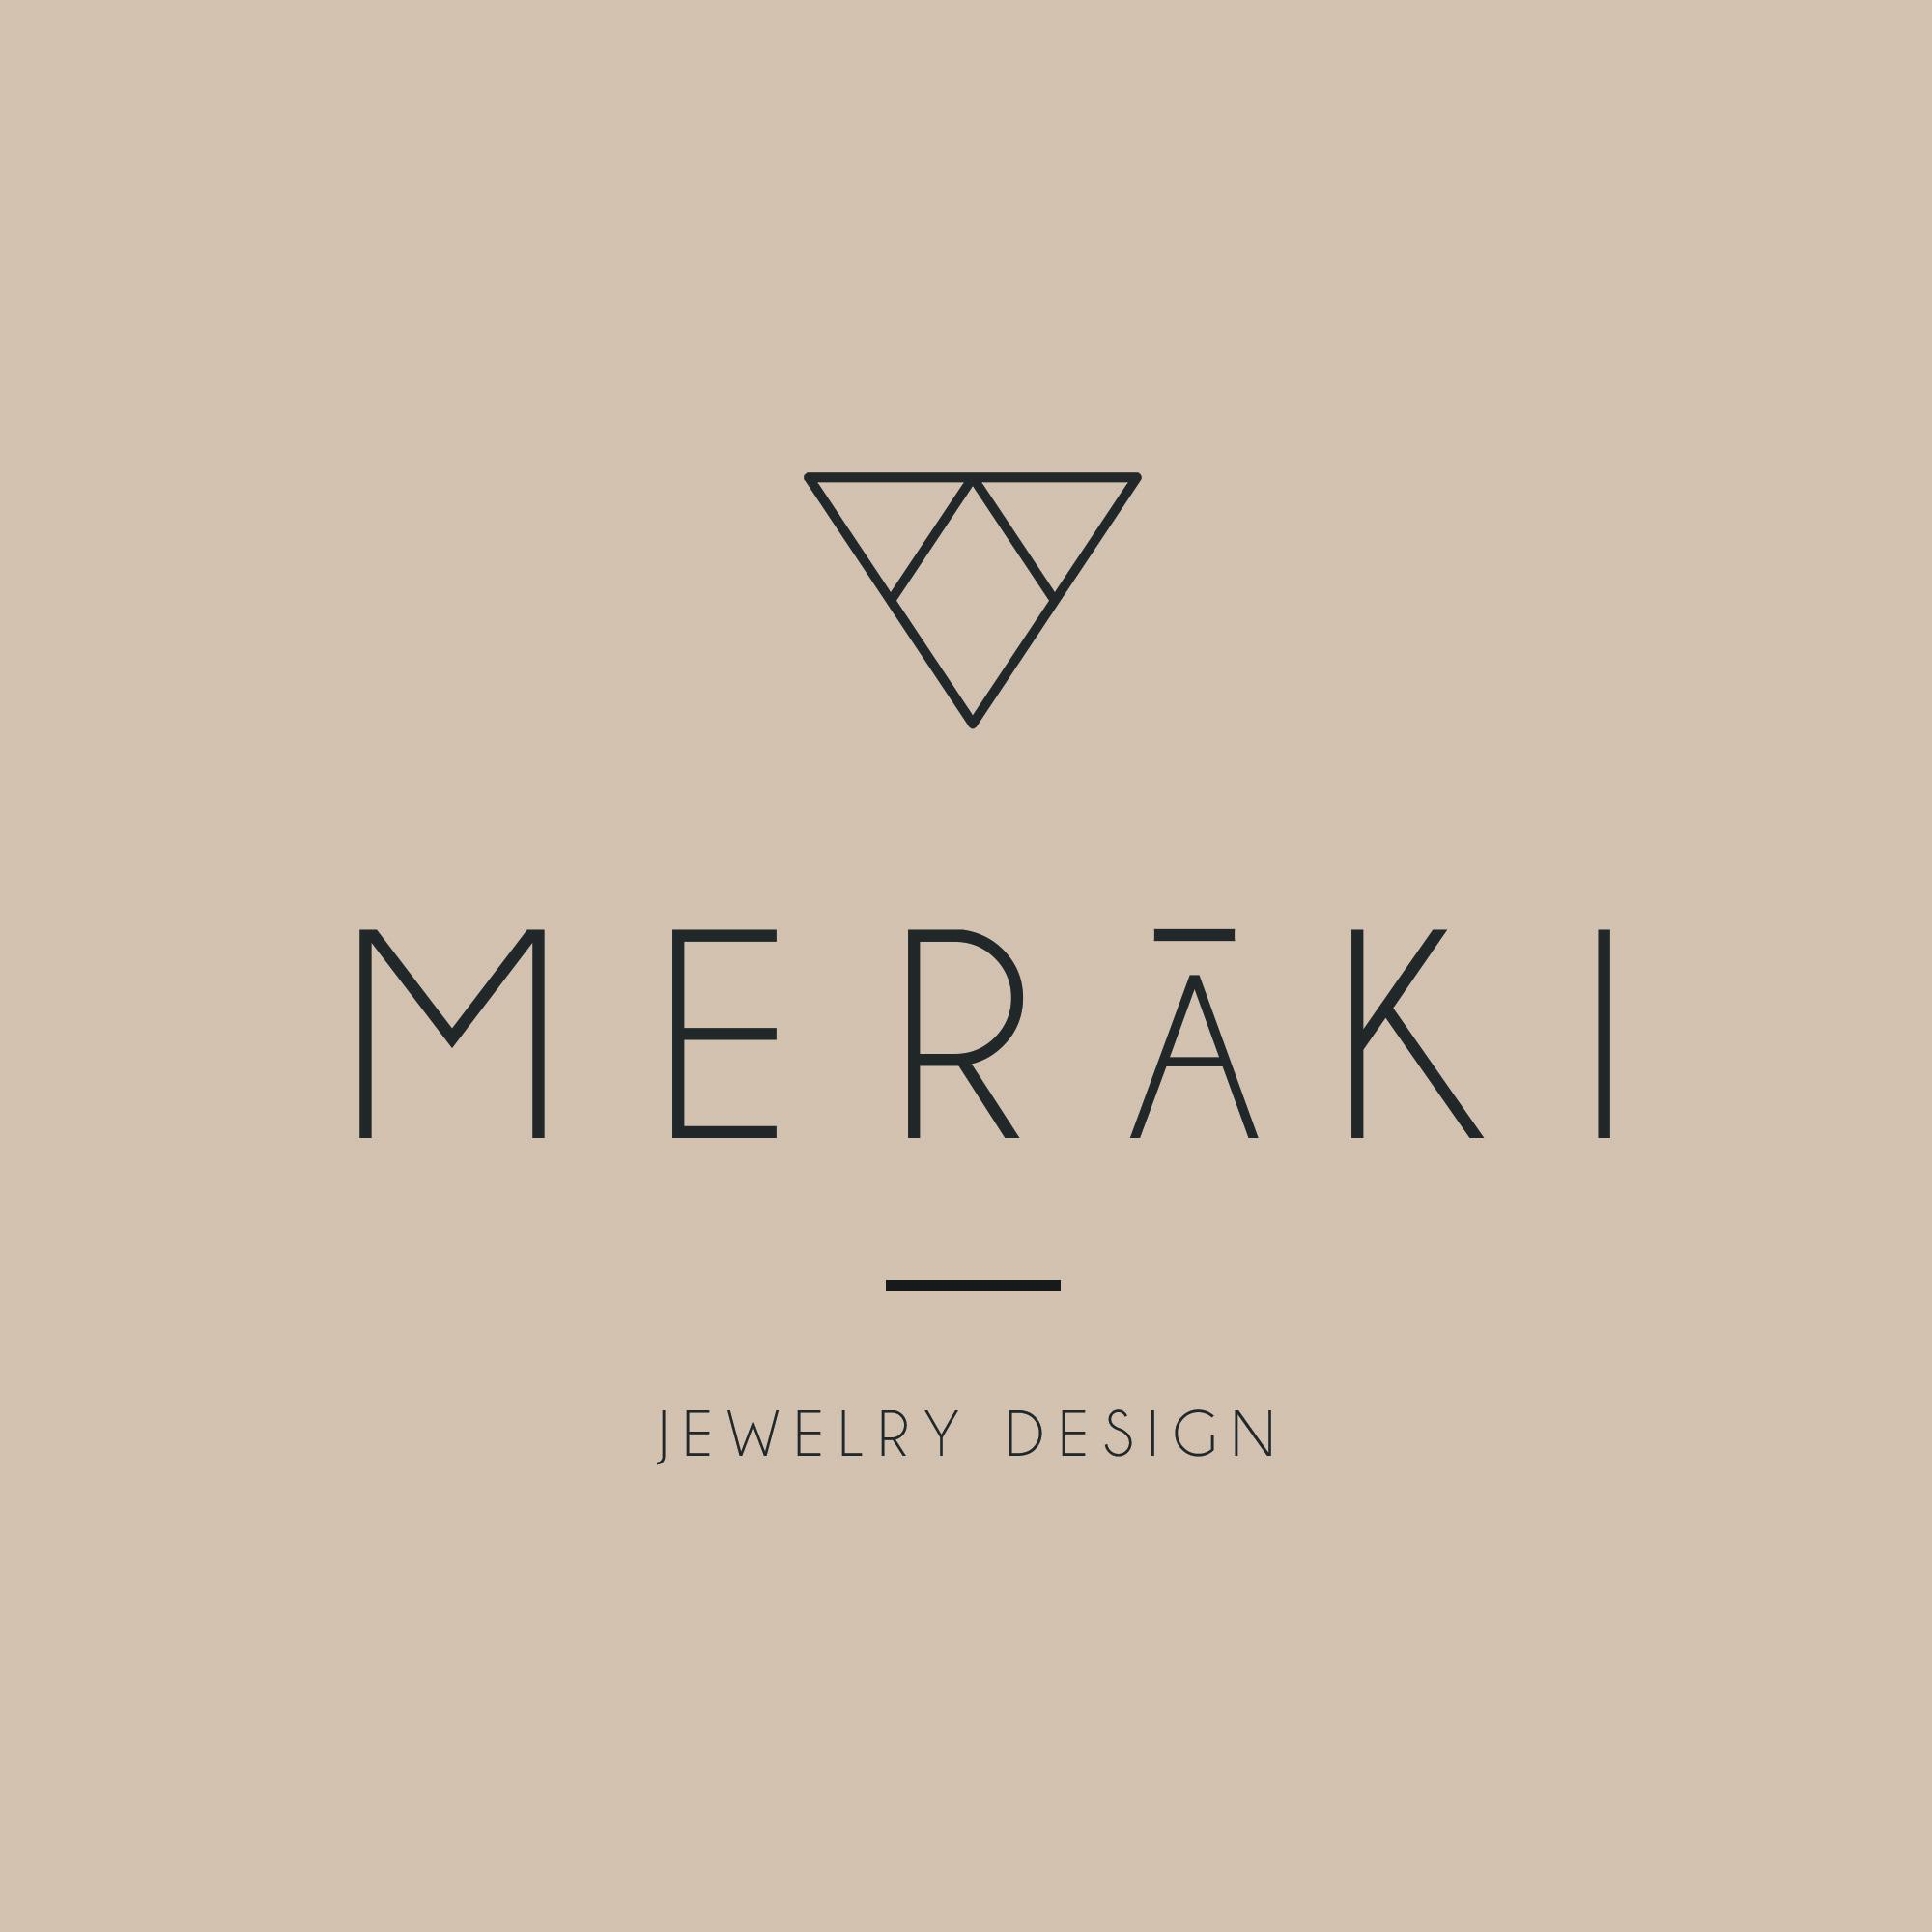 MerakiFinal copy.jpg